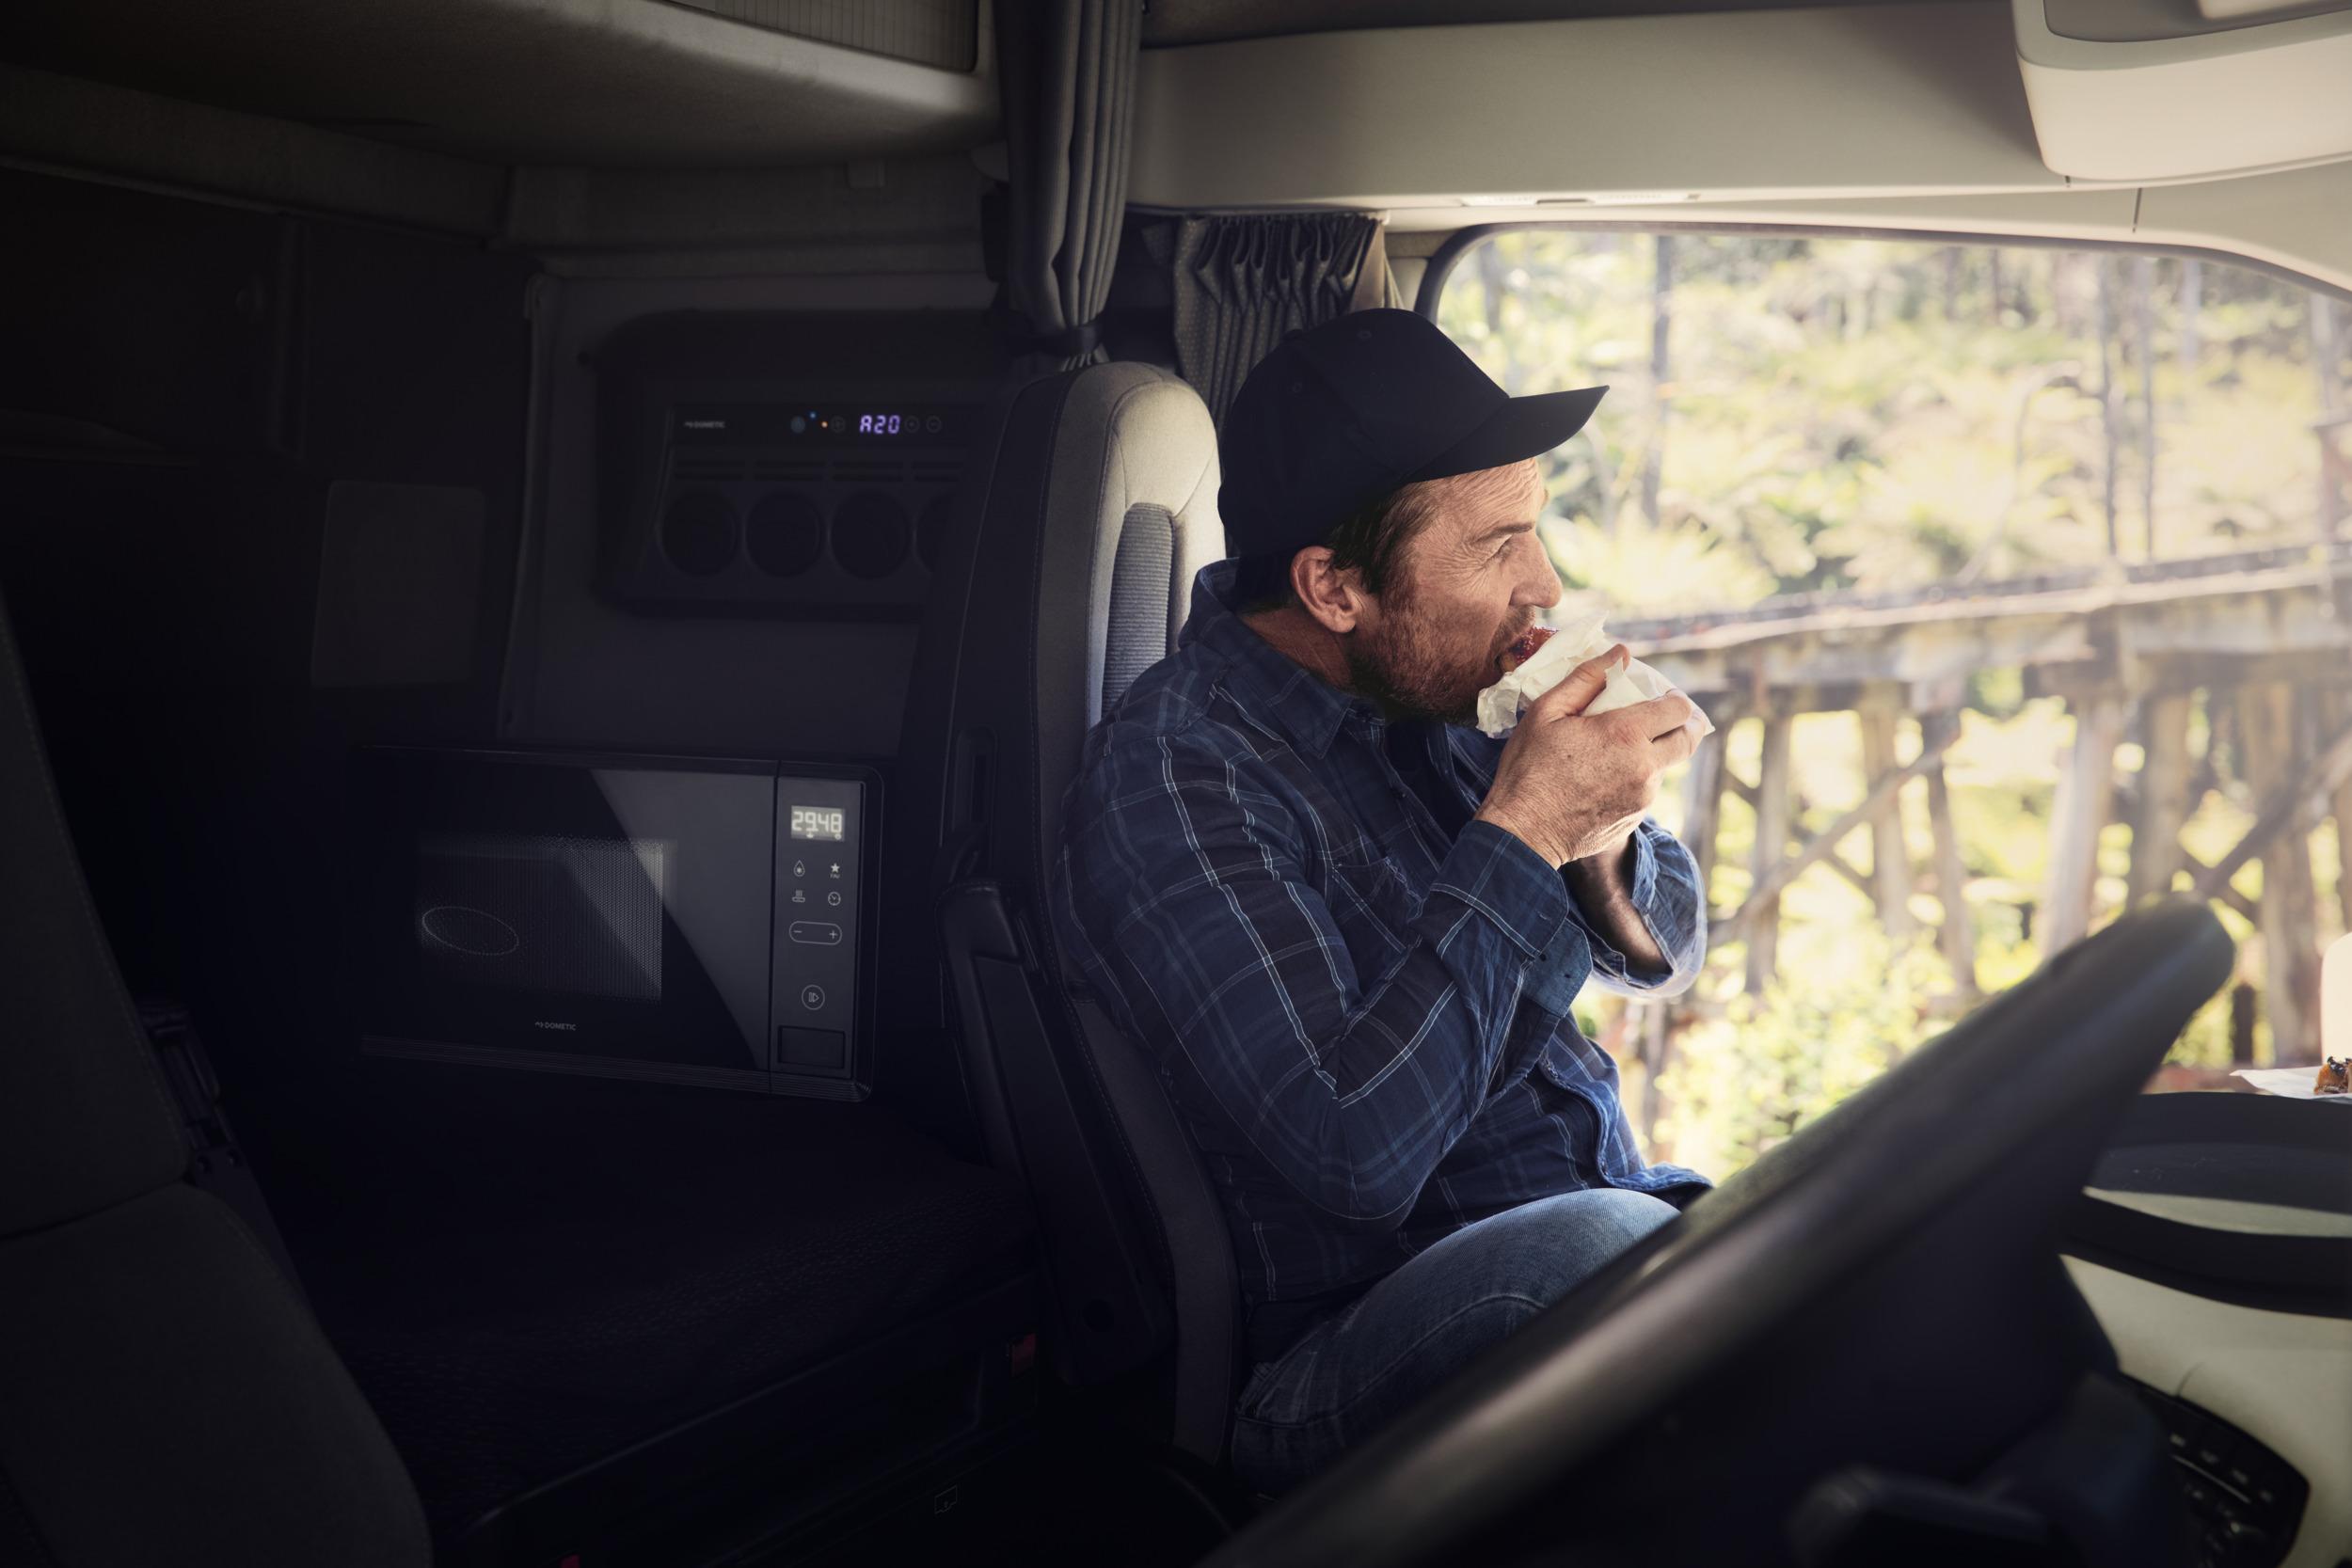 truck microwaves 24v with inverter